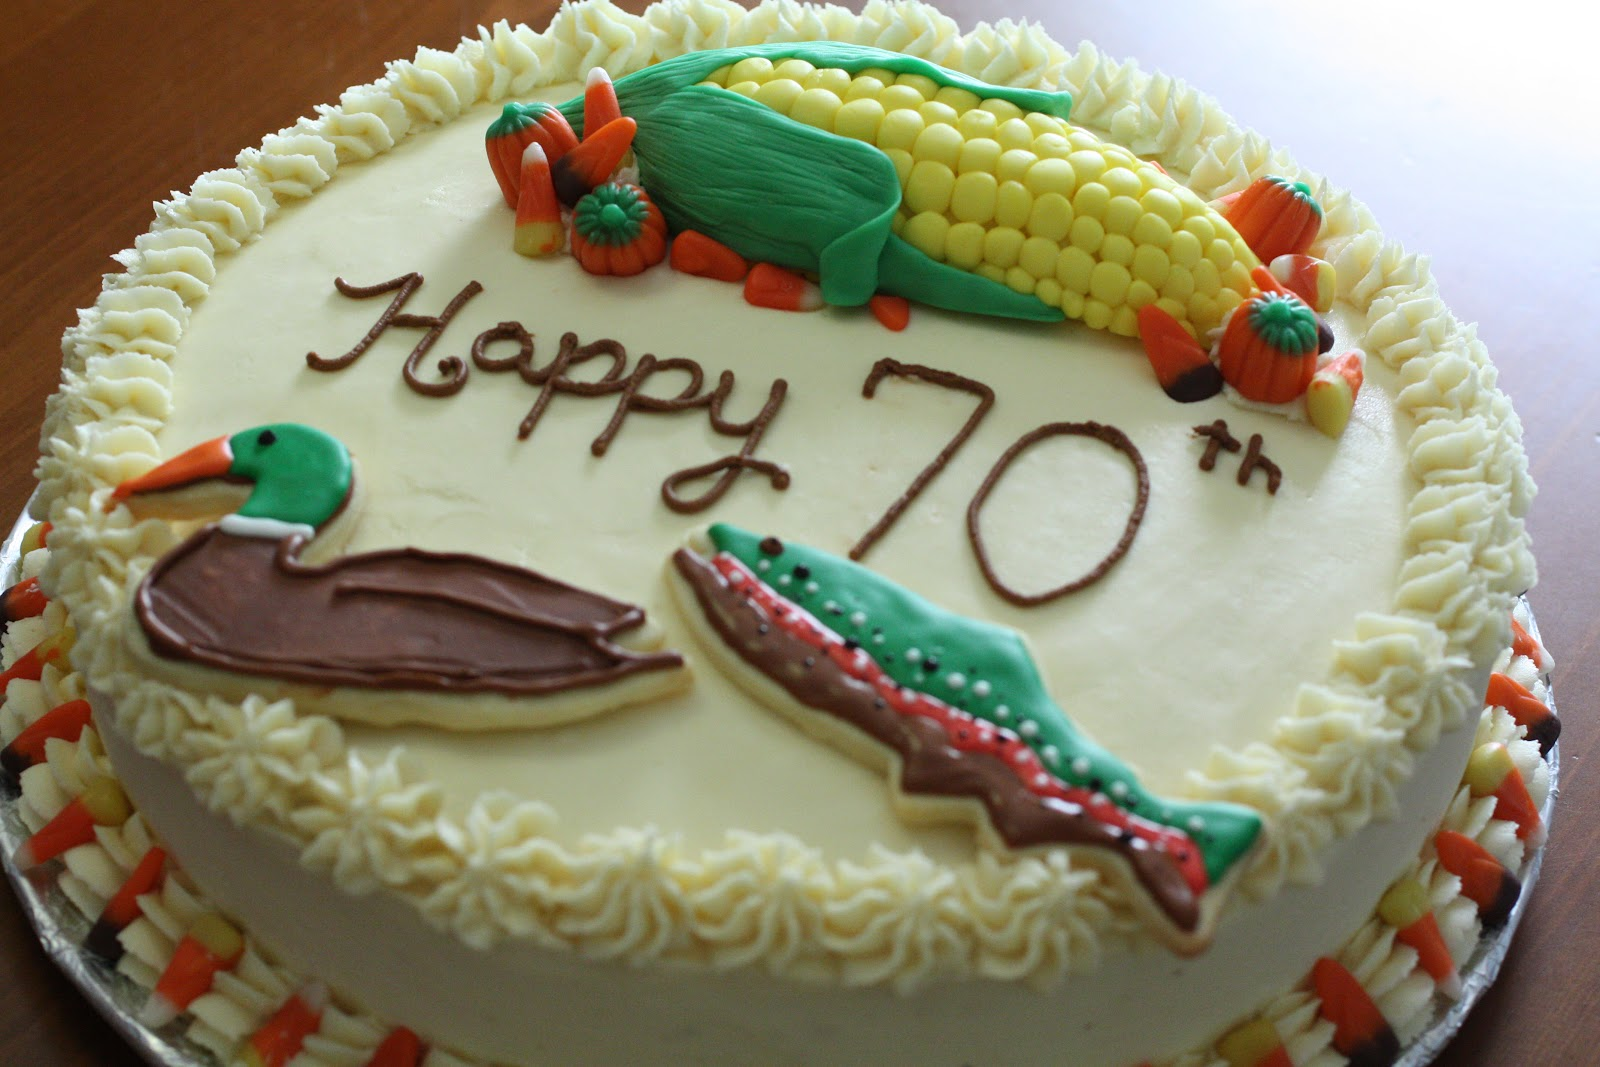 White Cake Recipe King Arthur: Brooketrout Designs: 70th Birthday Cake